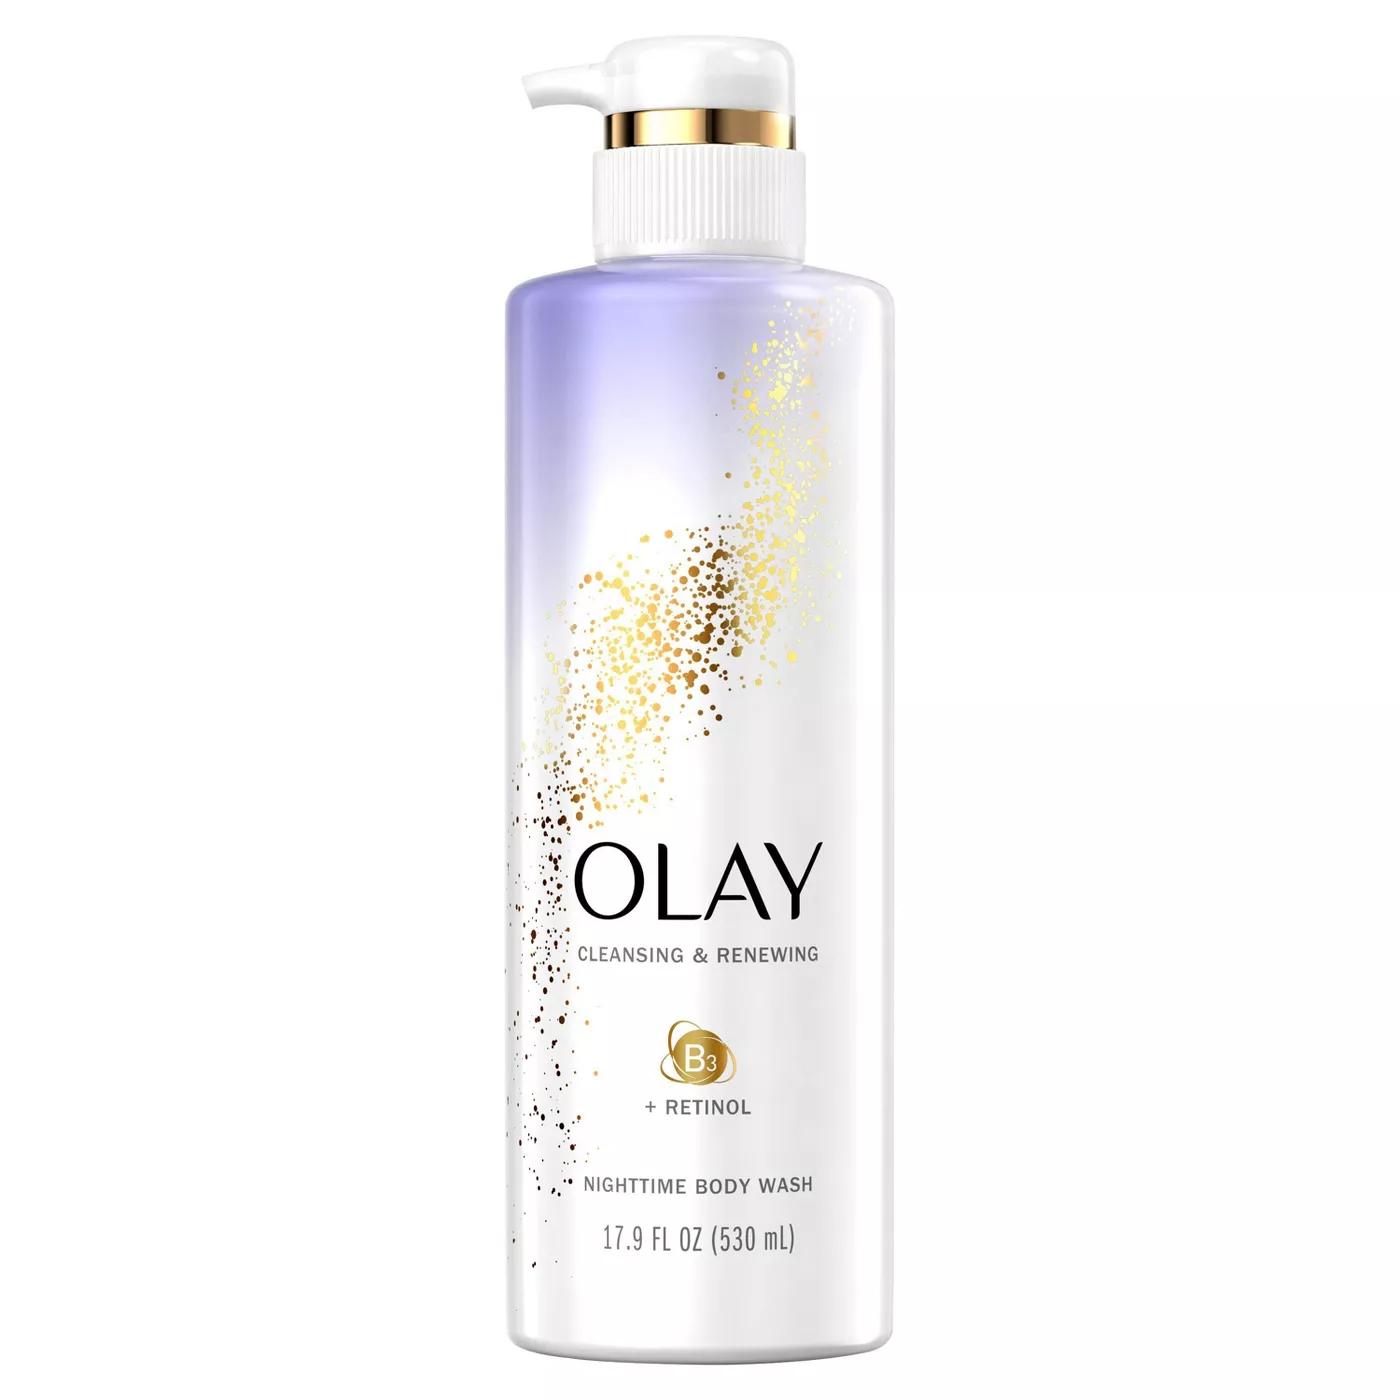 olay body wash with retinol